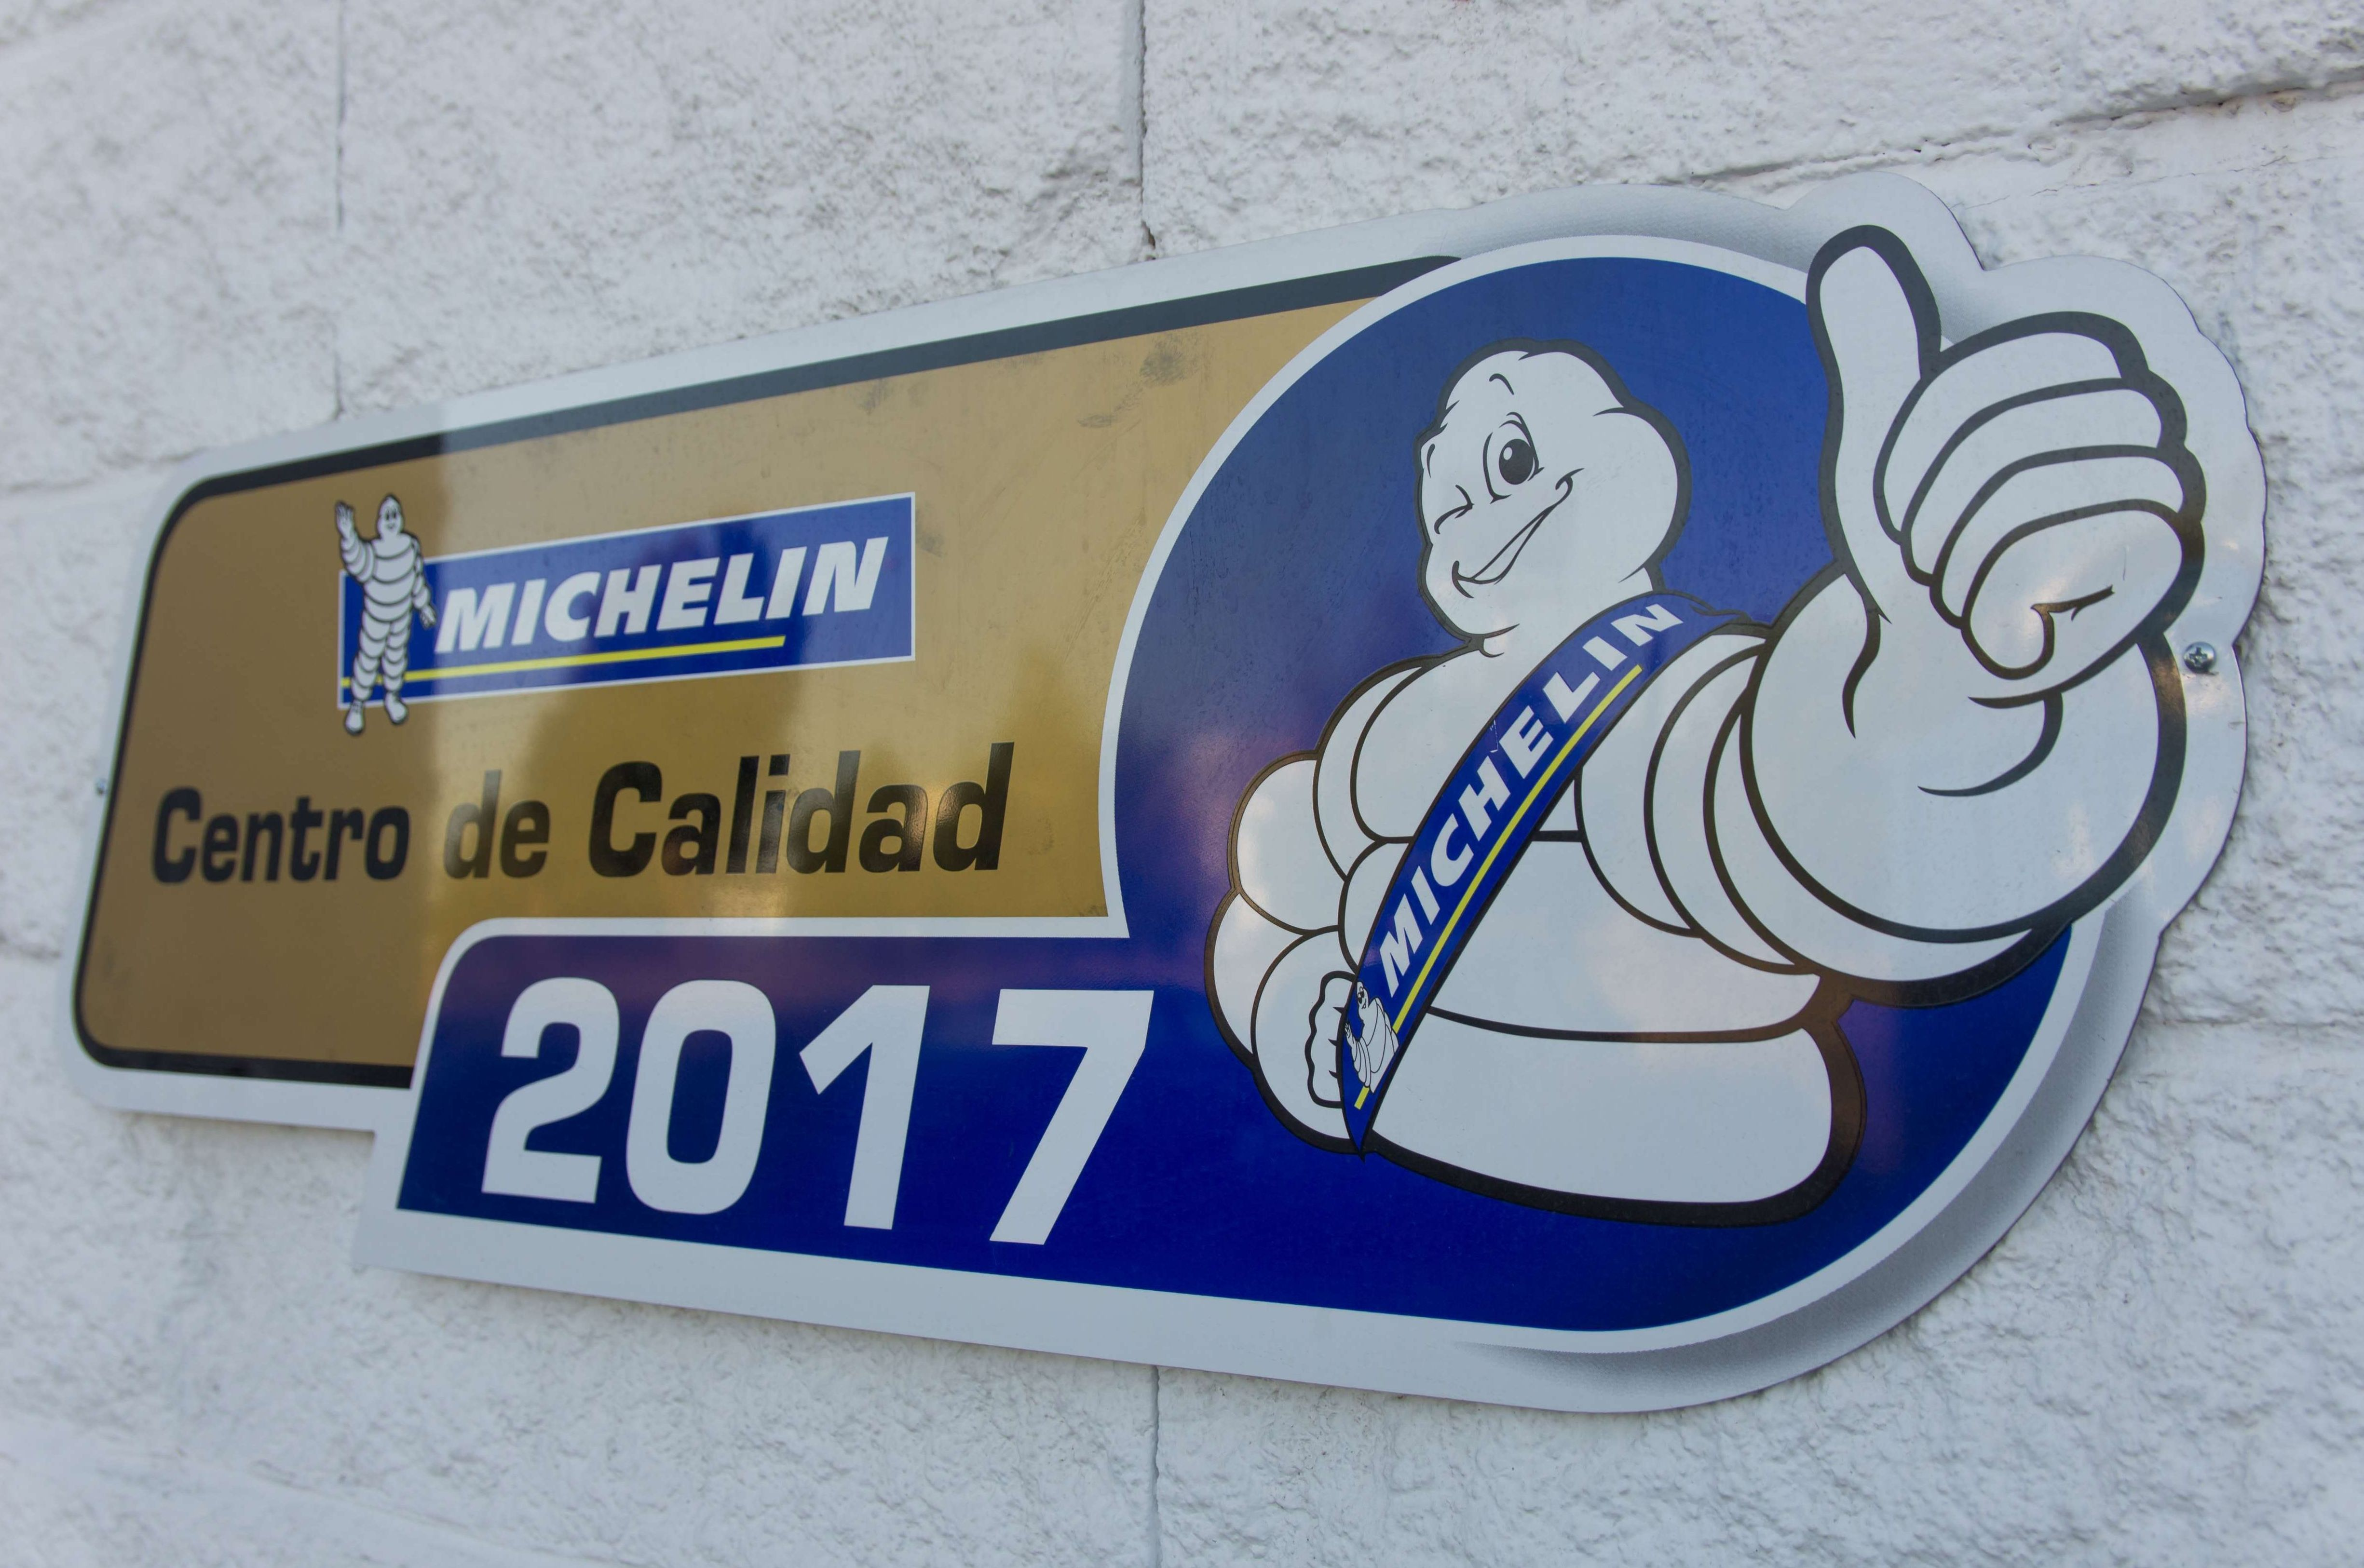 Promoción Neumáticos Michelin Julio 2018